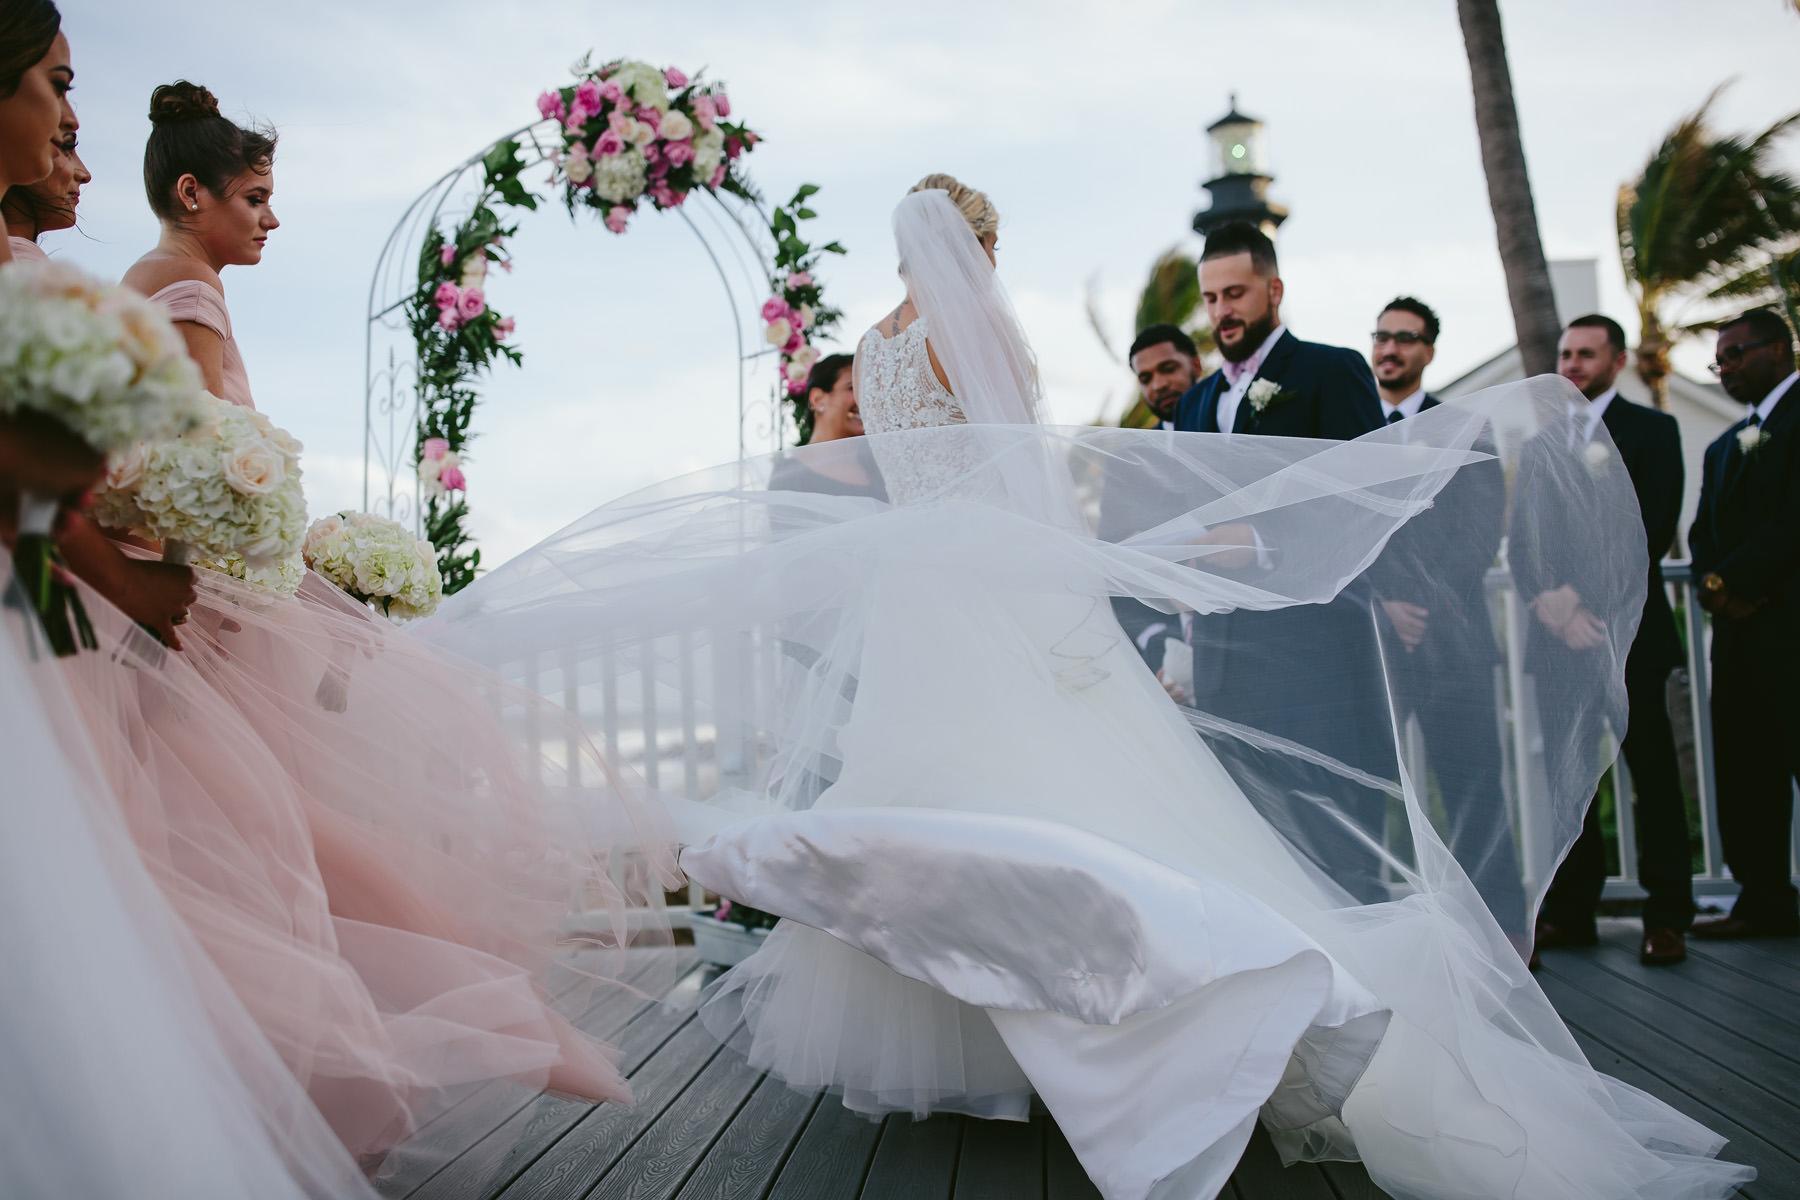 windy-beach-wedding-veil-flying-tiny-house-photo-florida-photographer.jpg